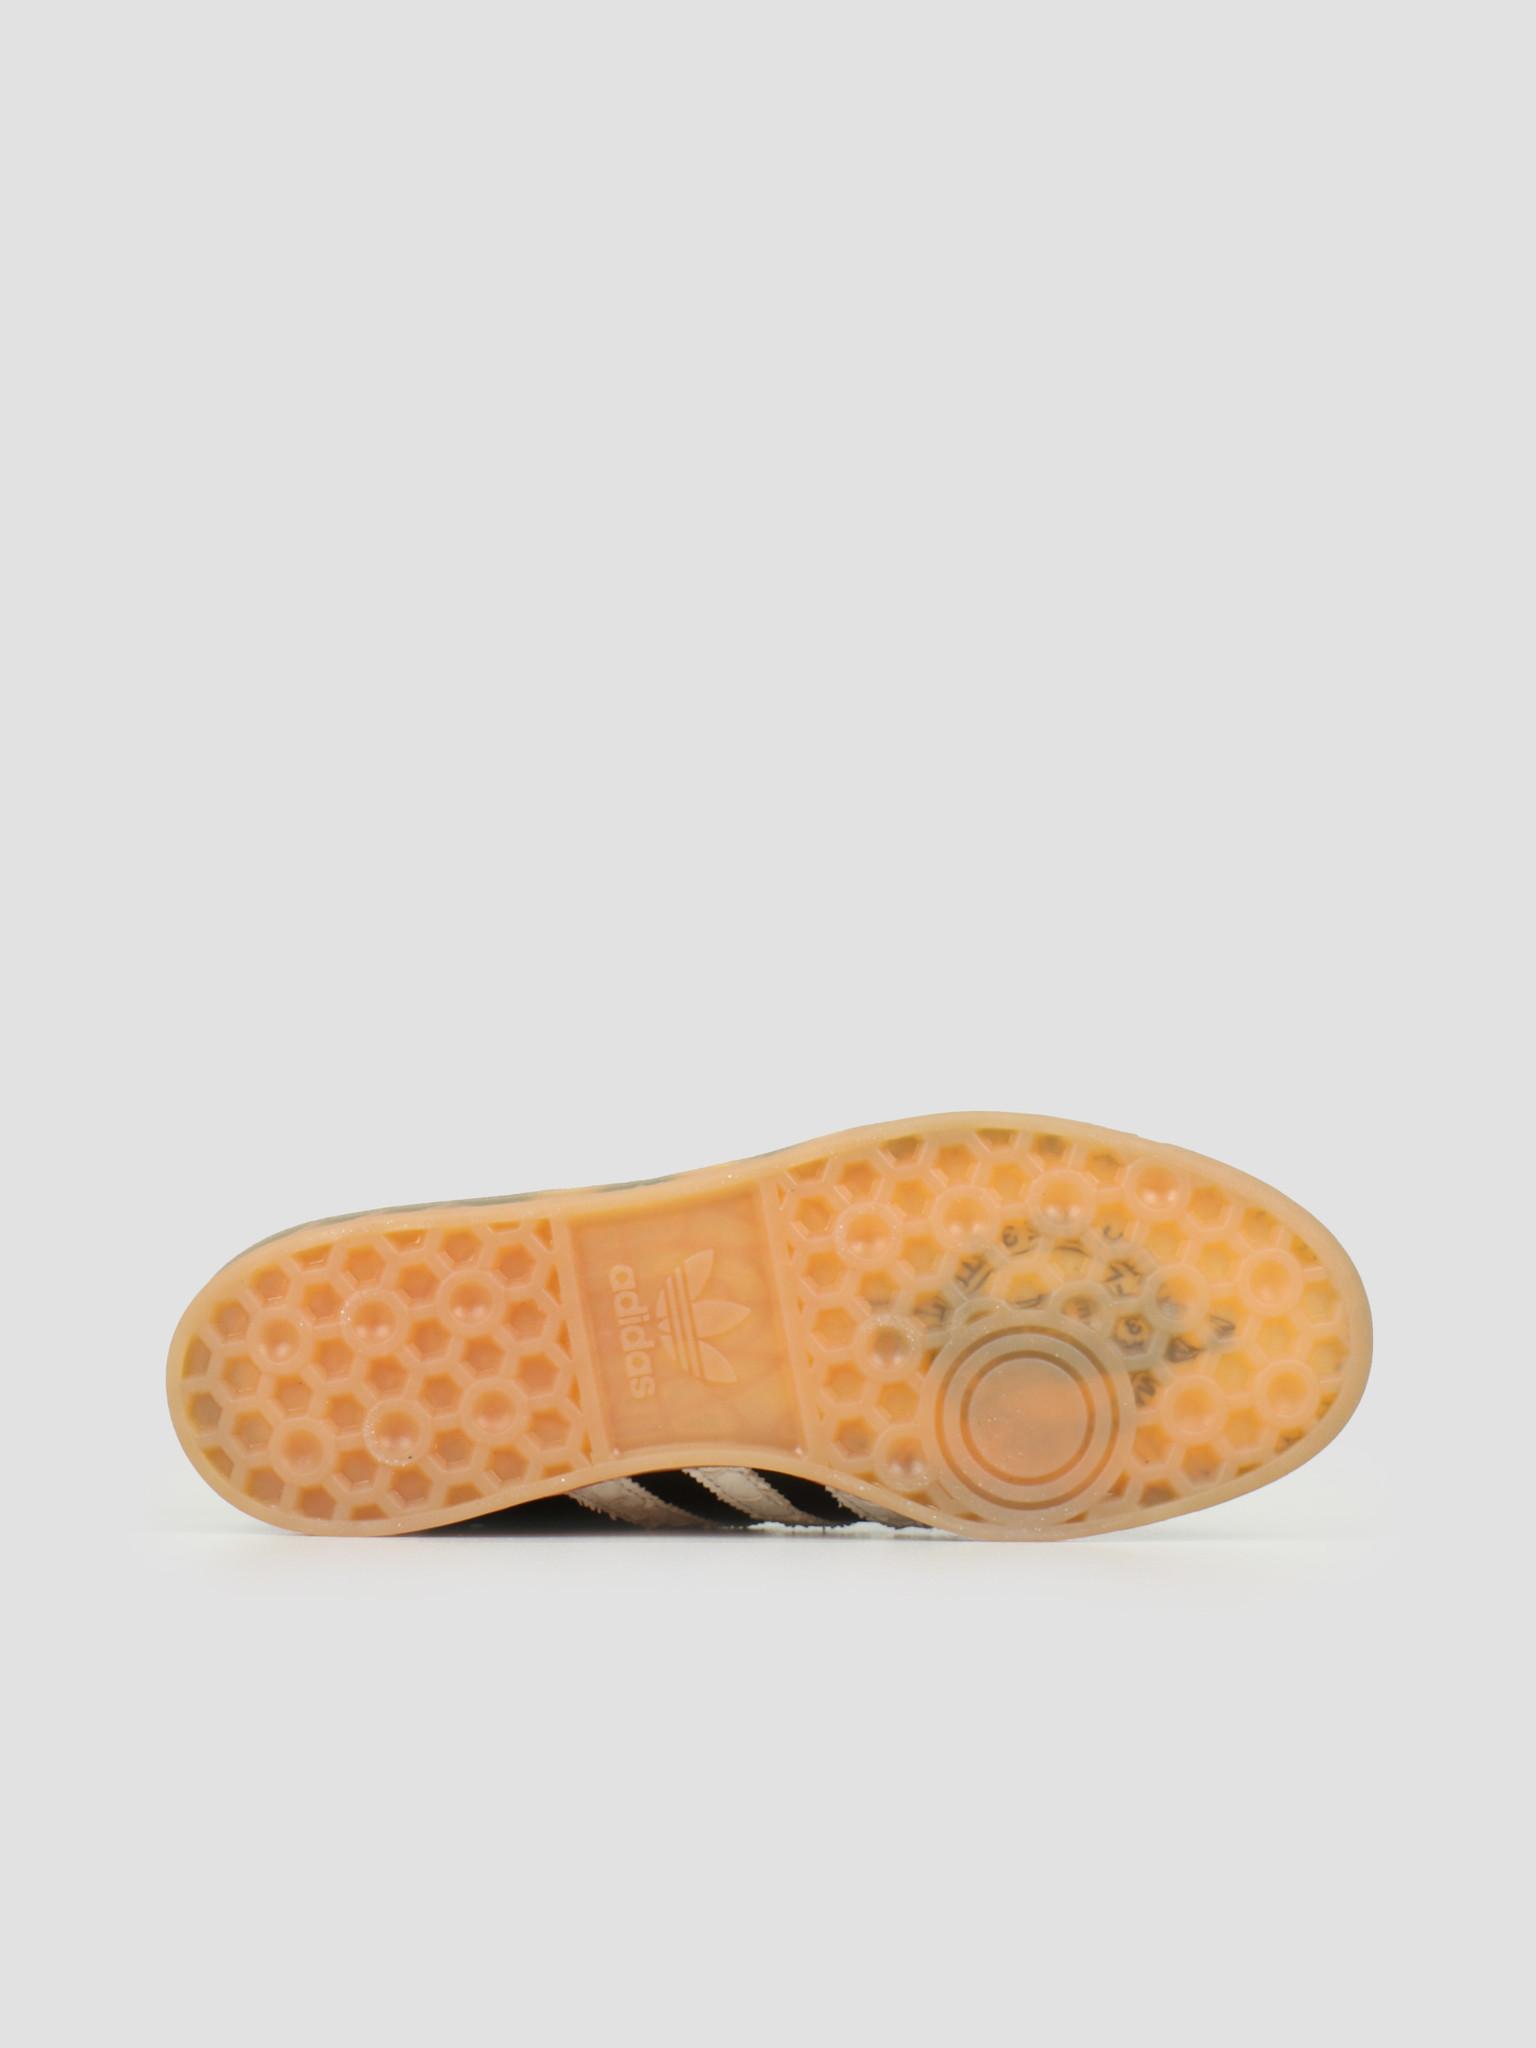 adidas adidas Hamburg Core Black Footwear White Lush Red EF5674